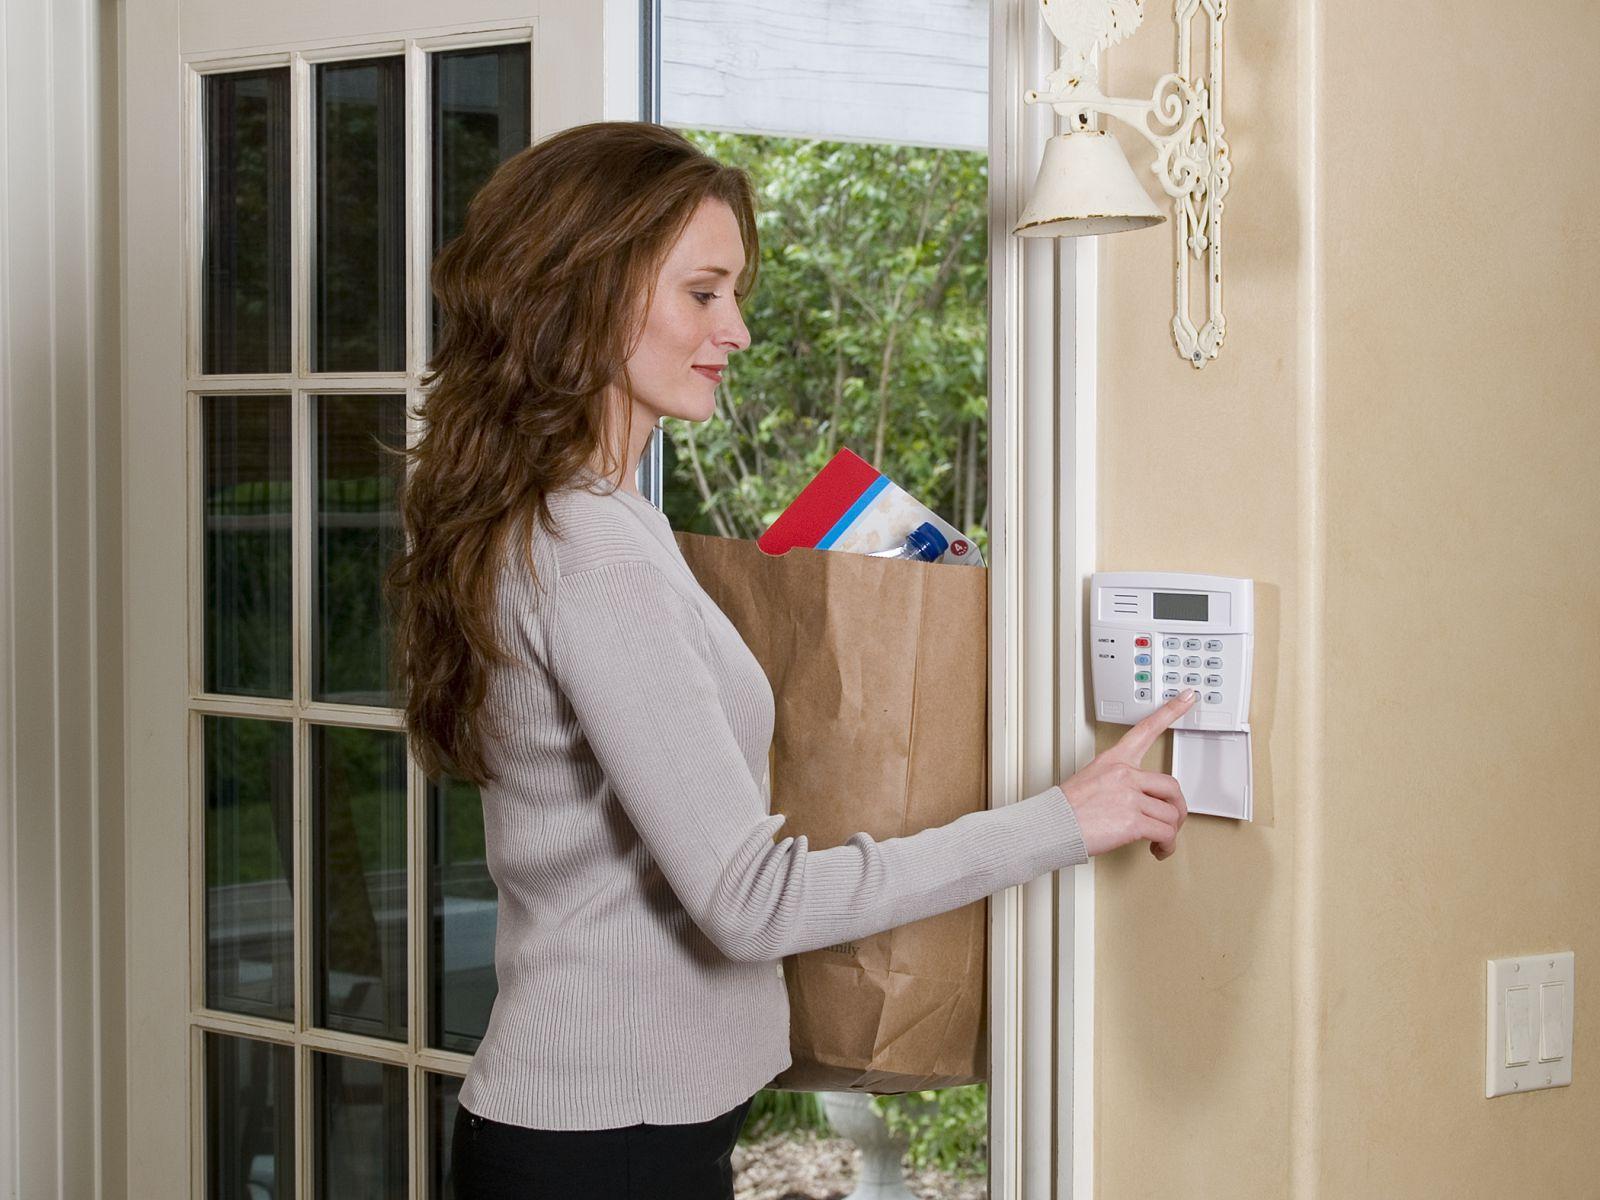 Honeywell Woman At Home Keypad